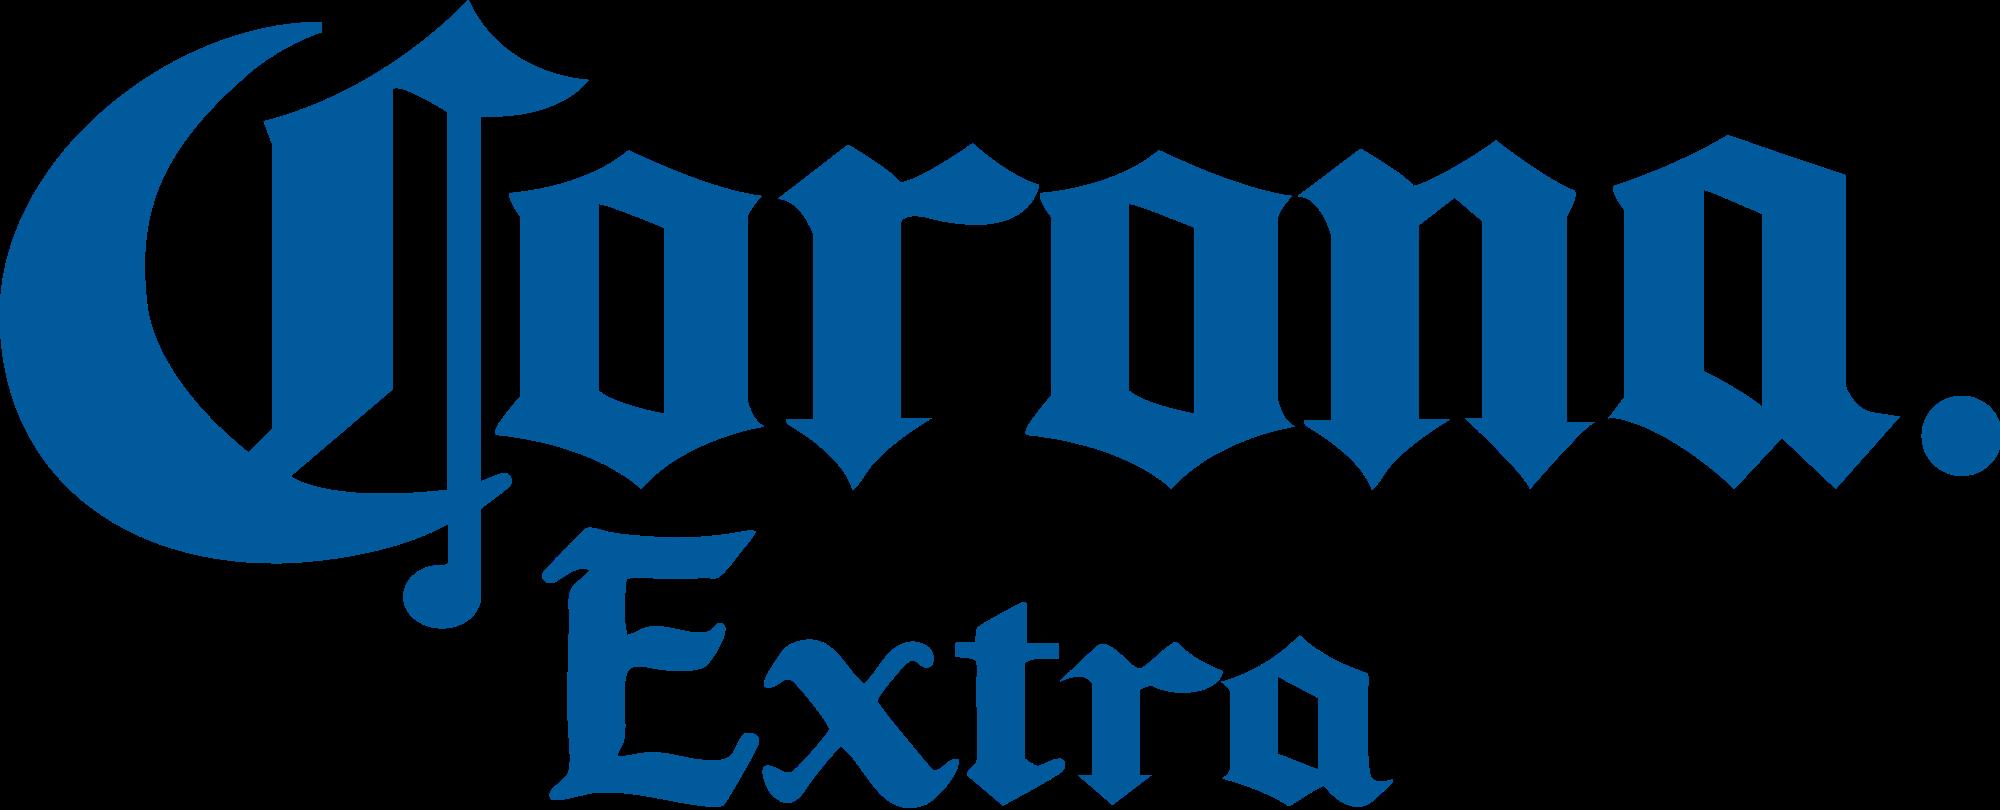 Corona Beer Logos